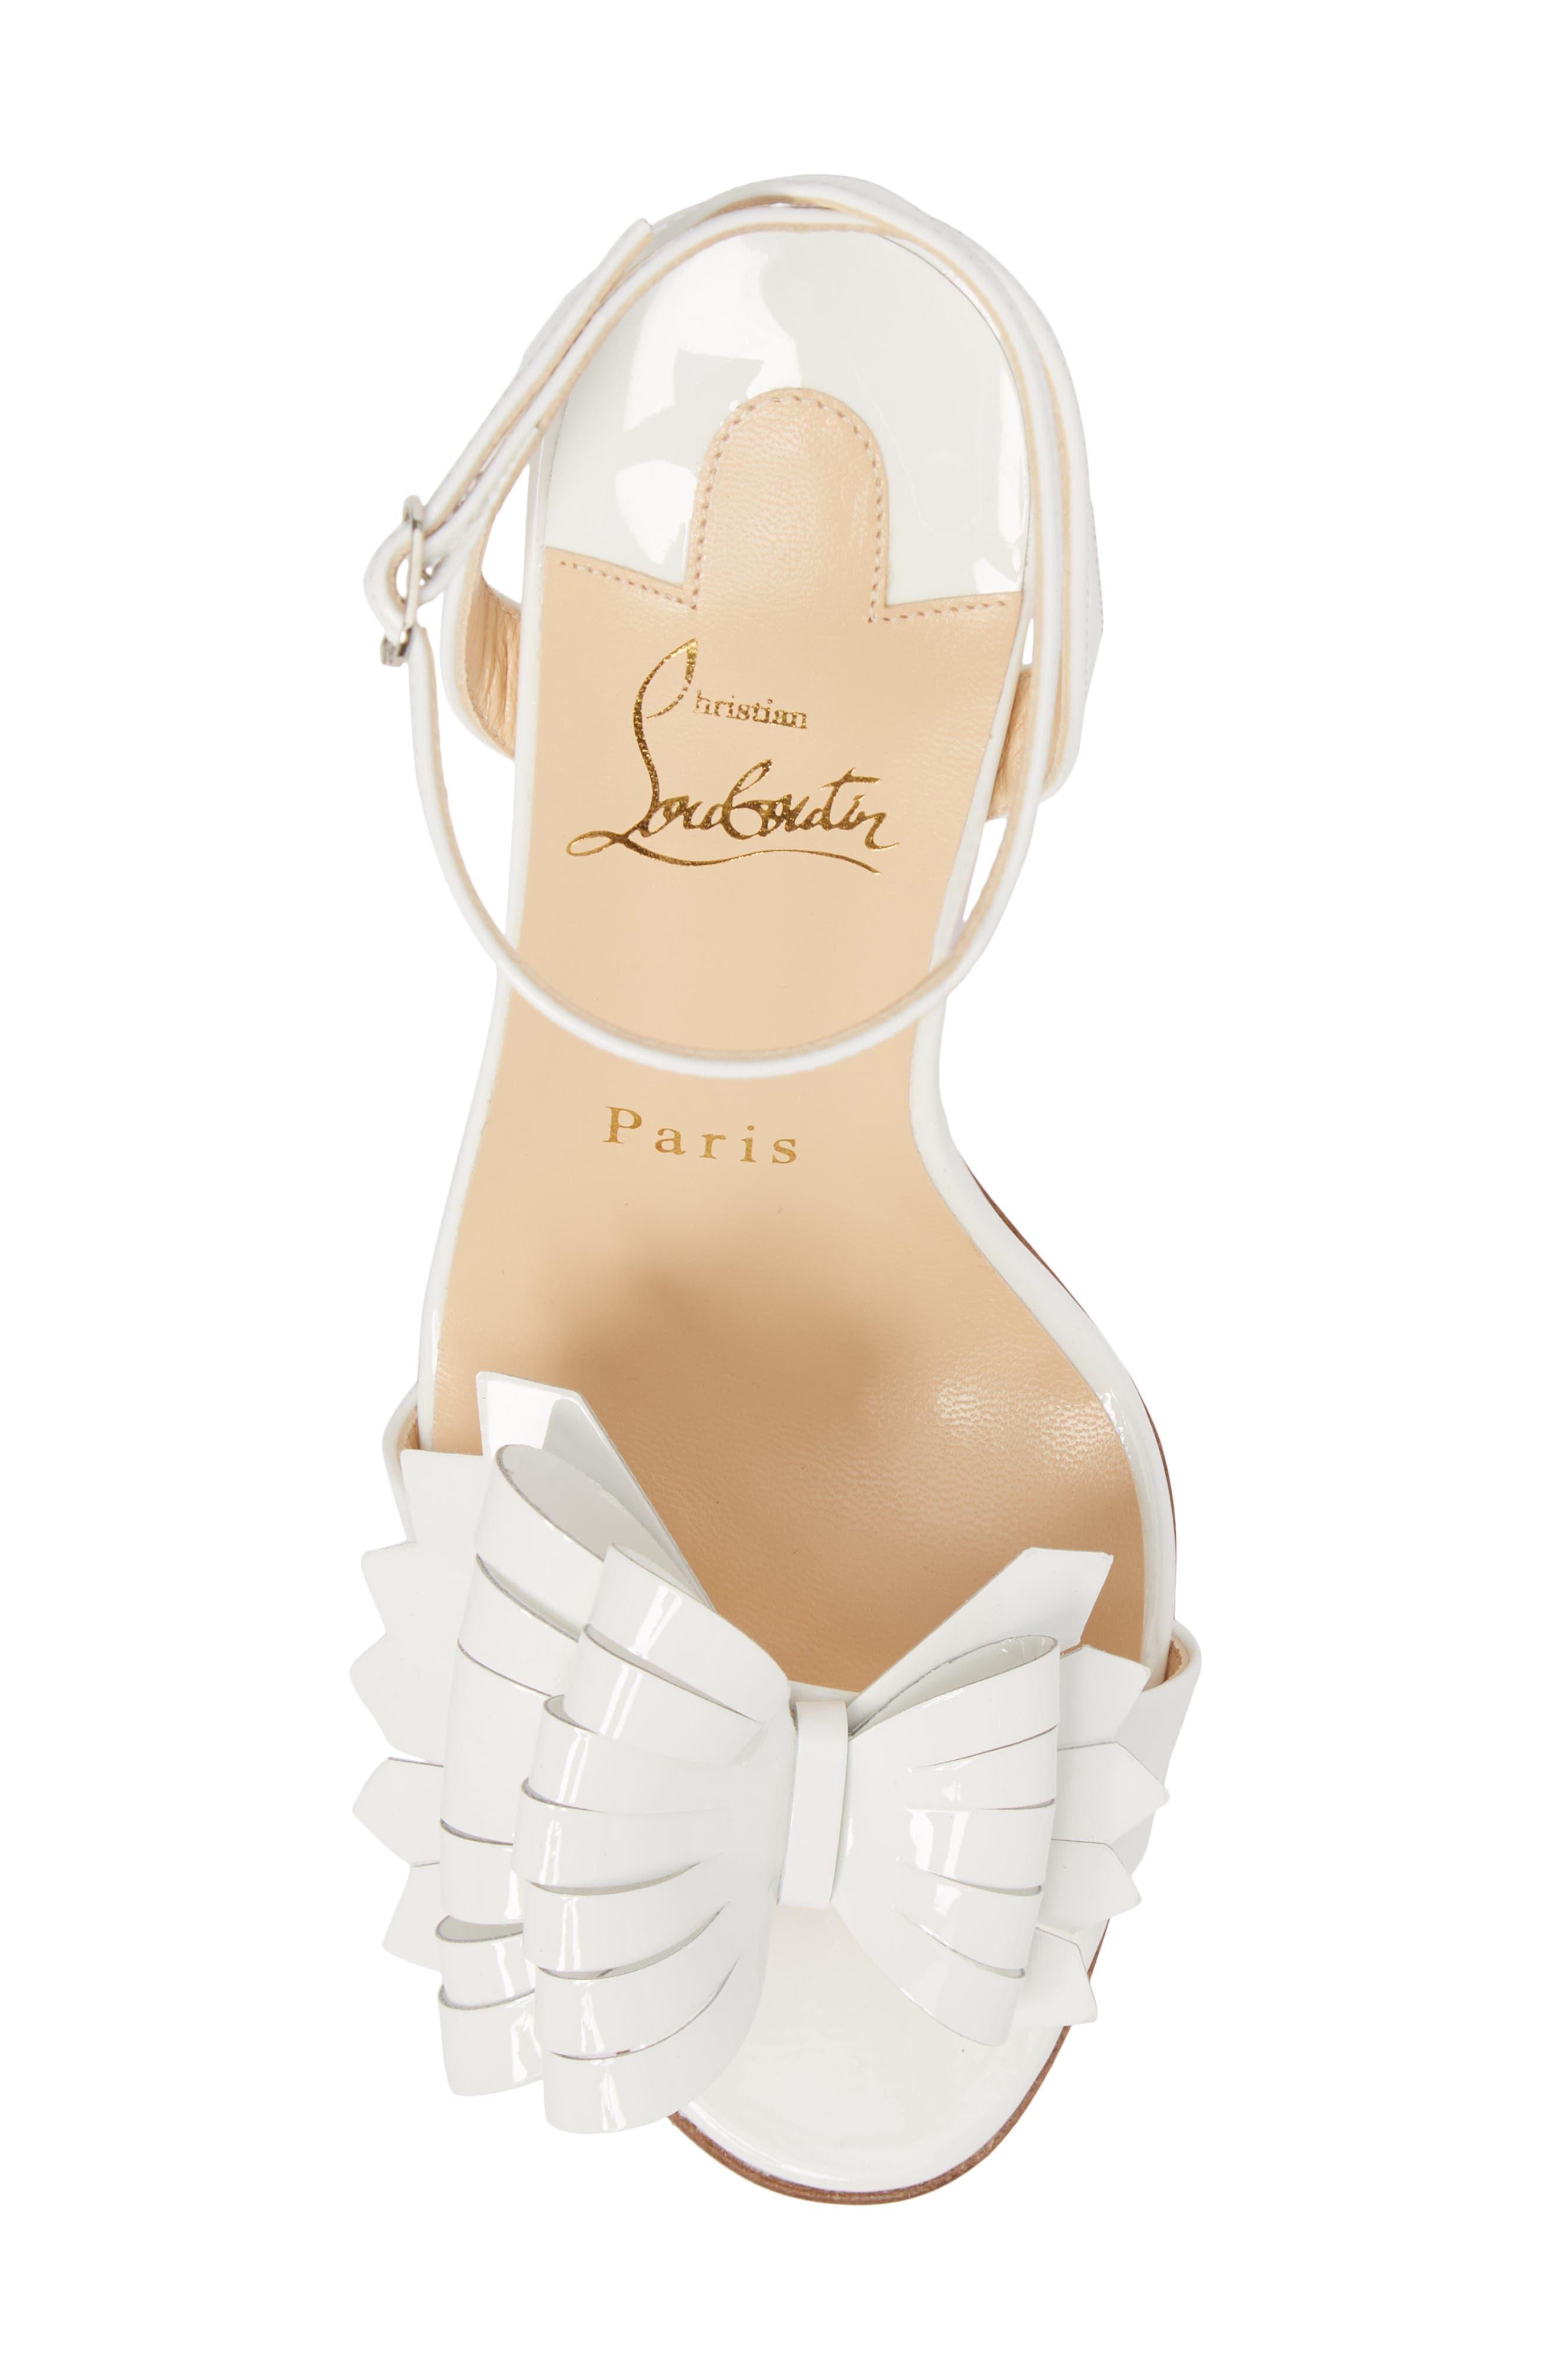 Miss Valois Bow Ankle Strap Sandal,                             Alternate thumbnail 10, color,